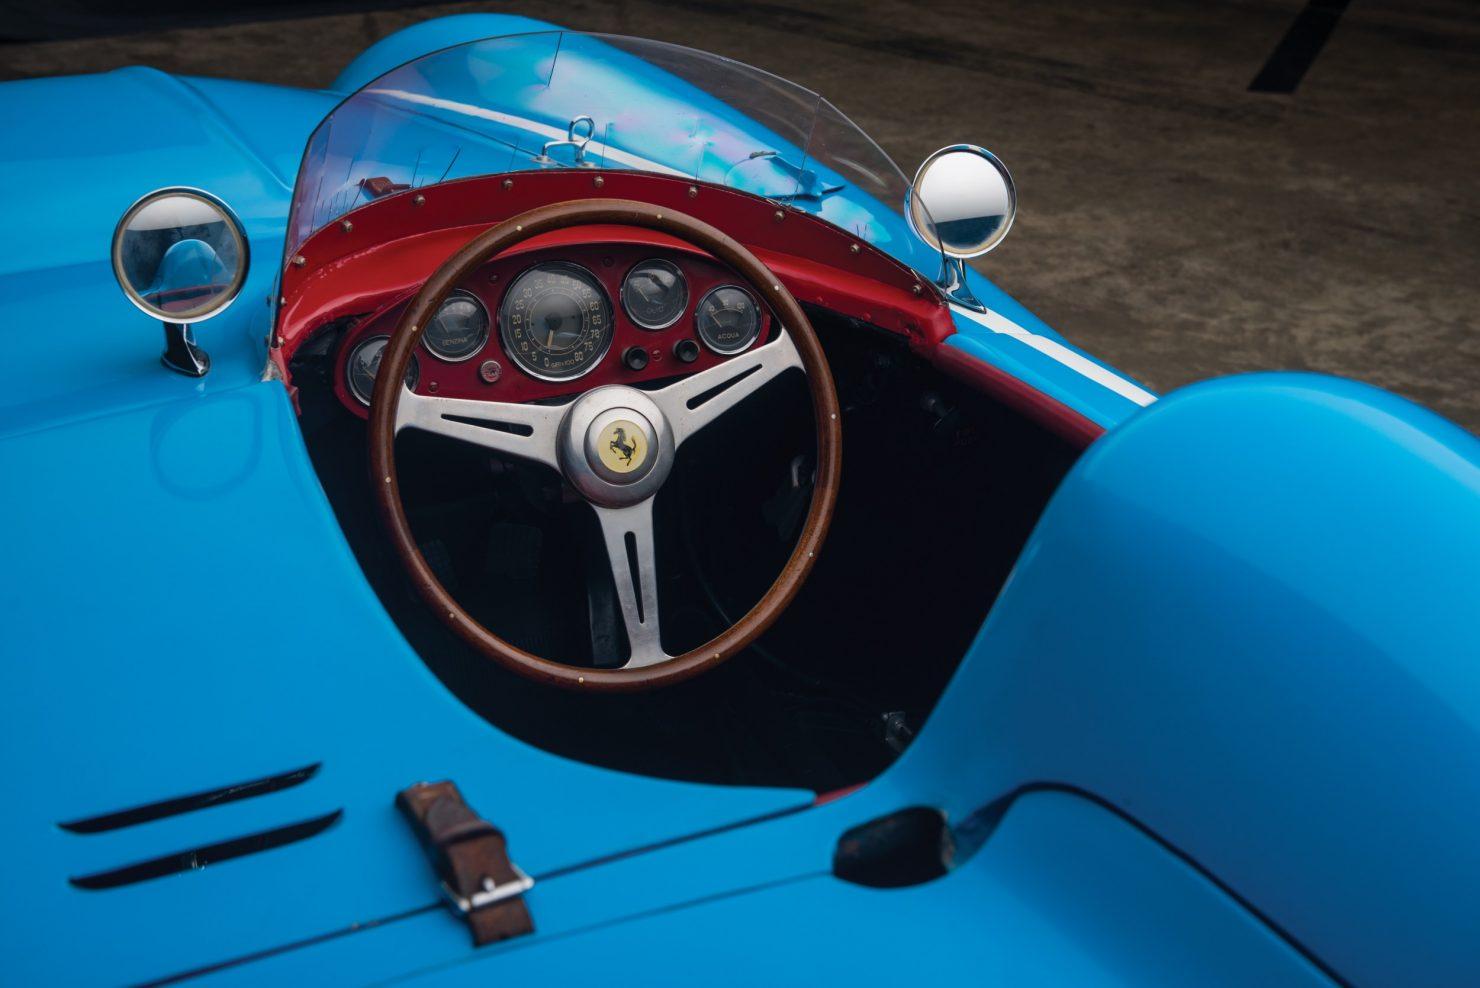 ferrari 121 lm spider 14 1480x988 - 1955 Ferrari 121 LM